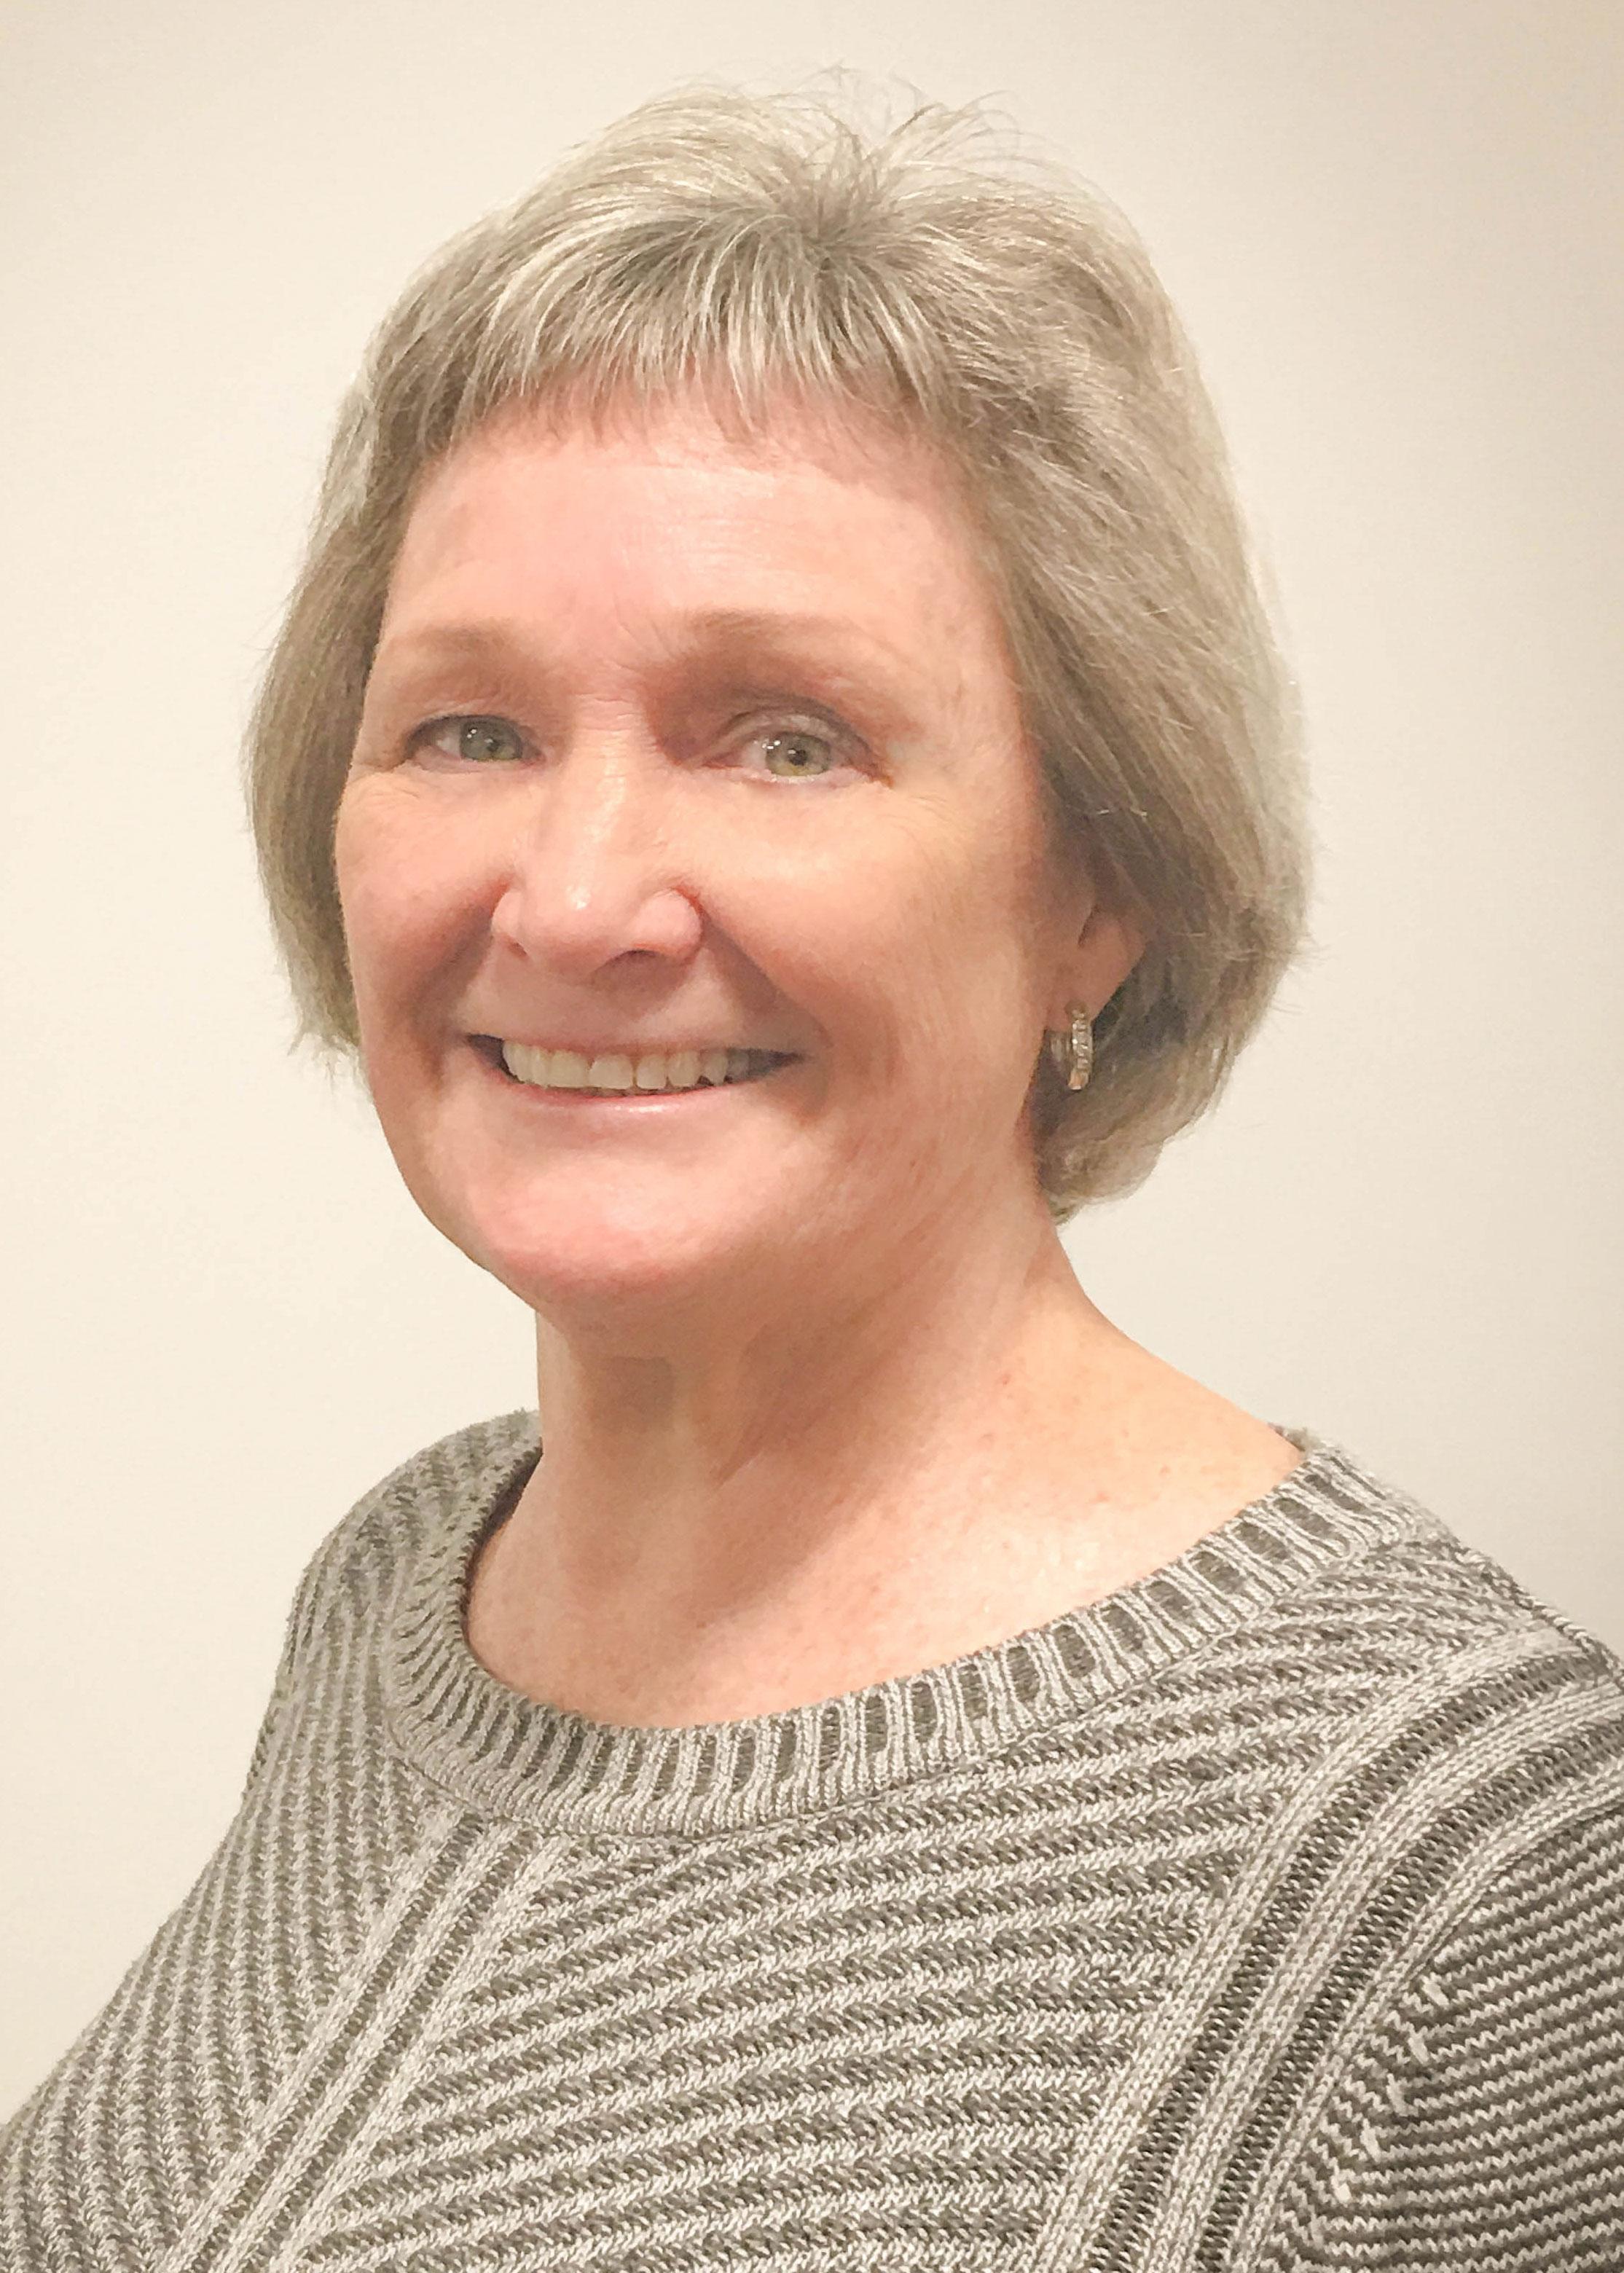 Becky Seitter, board member